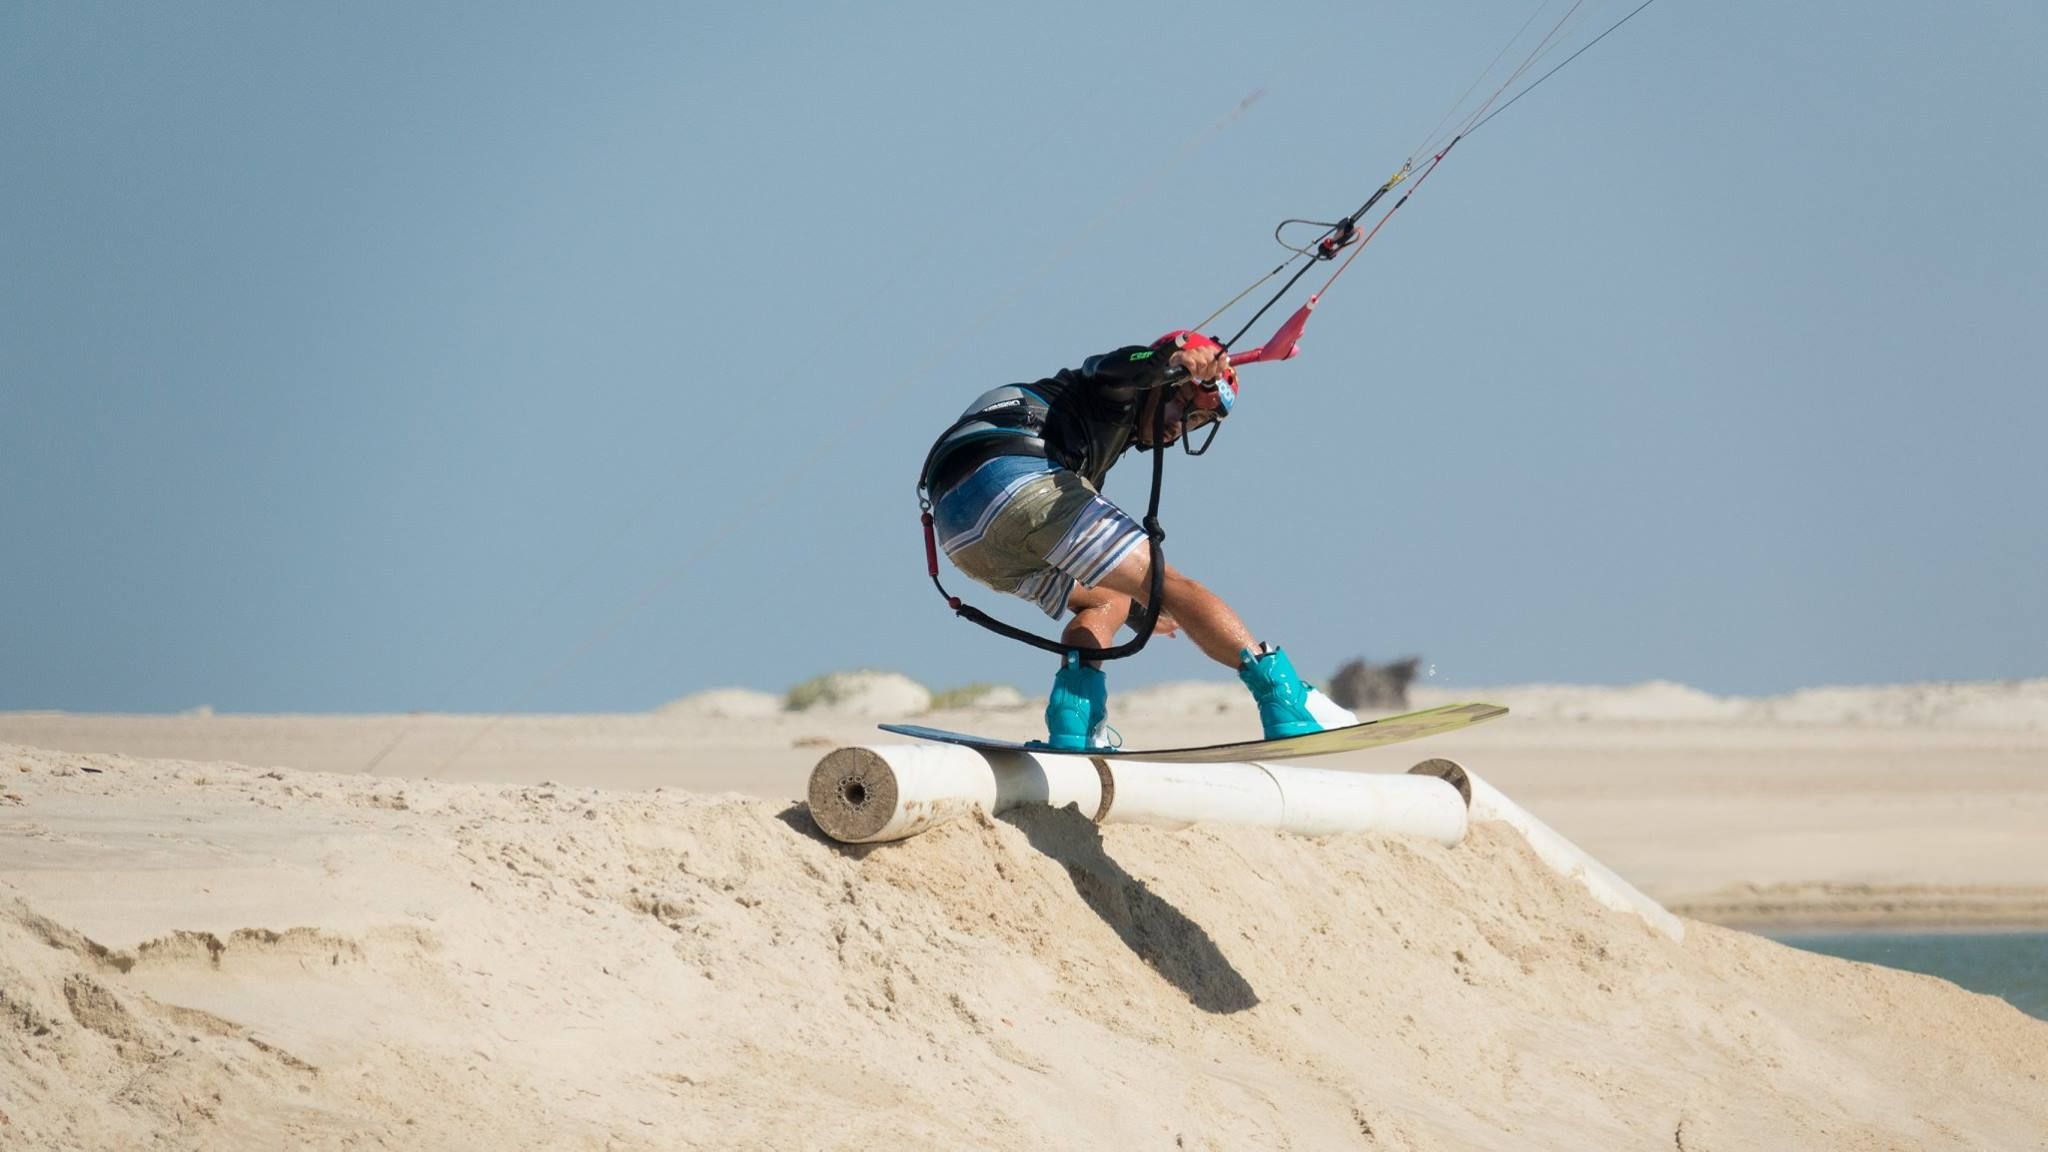 Hugo Guias More News and Videos on http://universkite.com - #kitesurf #photooftheday #universkite.fr #kitesurfingphotos #kiteboardingphotos #kiteboarding #kiting #kitesurfersparadise #livetokite #kiteboard #kitesurfing #kite #kitesurfers #kitesurfingphotography #kitewave #watersportsaddict #kiteboardingzone #kiteaddicted #kitesurfbeach #kiteboard #kiteboardingzone #kitesurfen #kitespot #rci #kiteboarder #kitesurfadventure #kitesurfingworld